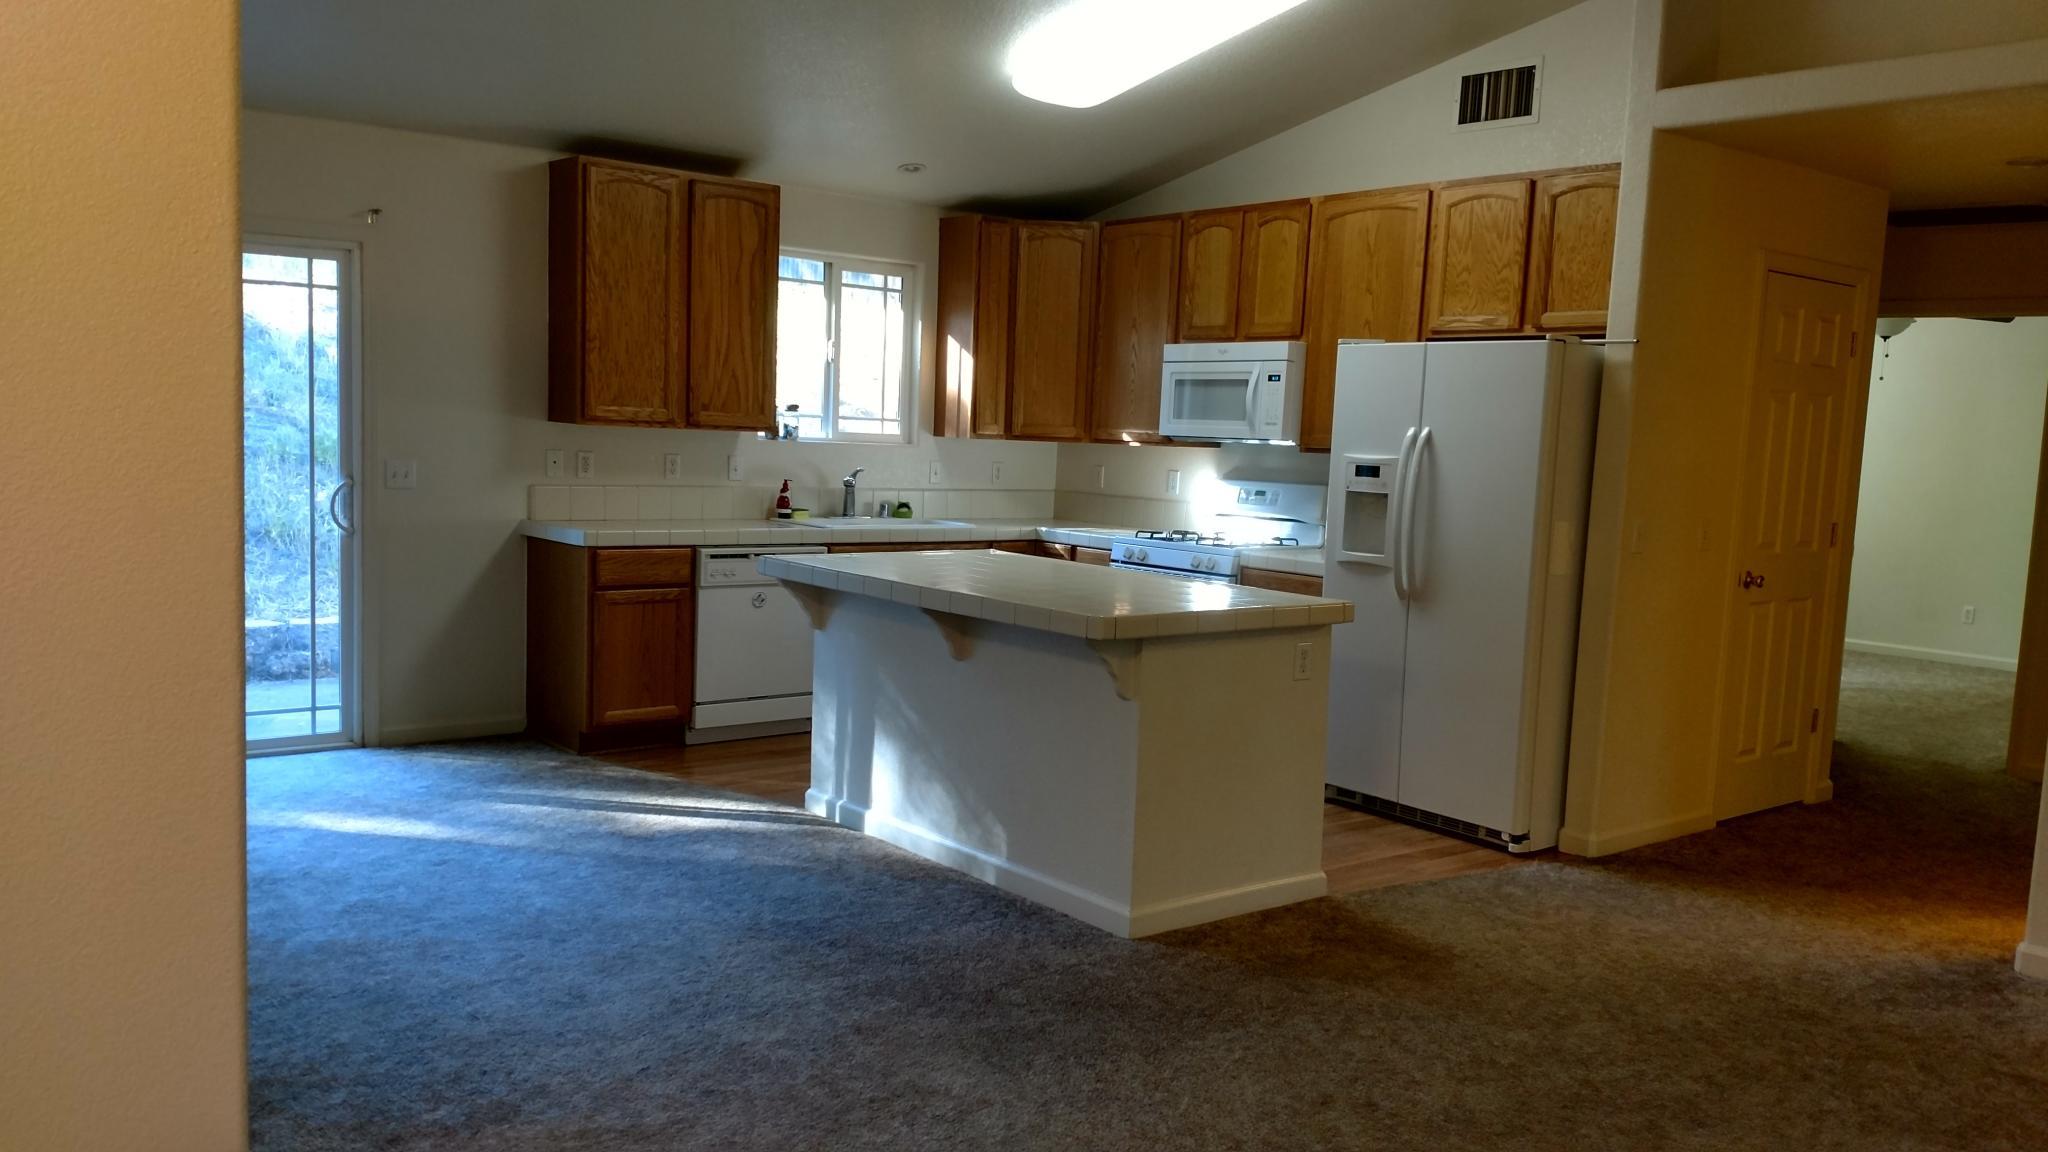 3763 Oro Bangor Hwy, Oroville, CA 95966 For Rent | Trulia